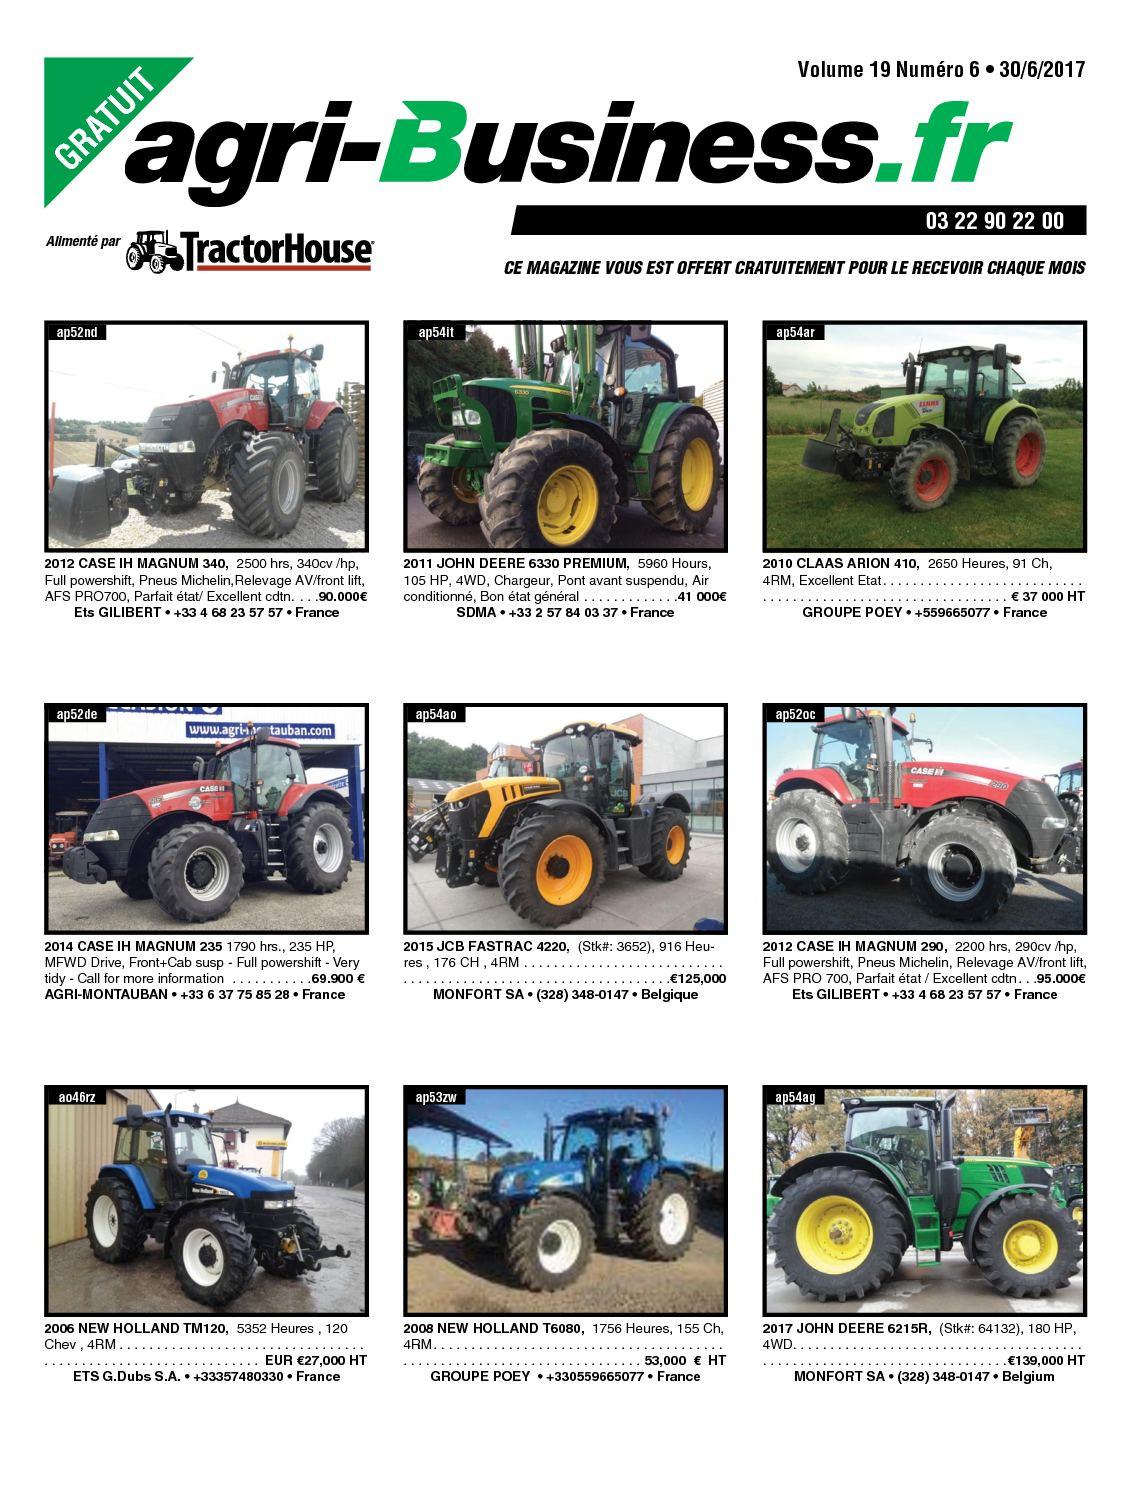 Calaméo - AGRI BUSINESS VOLUME 19 NUMÉRO 6 • 30/06/2017